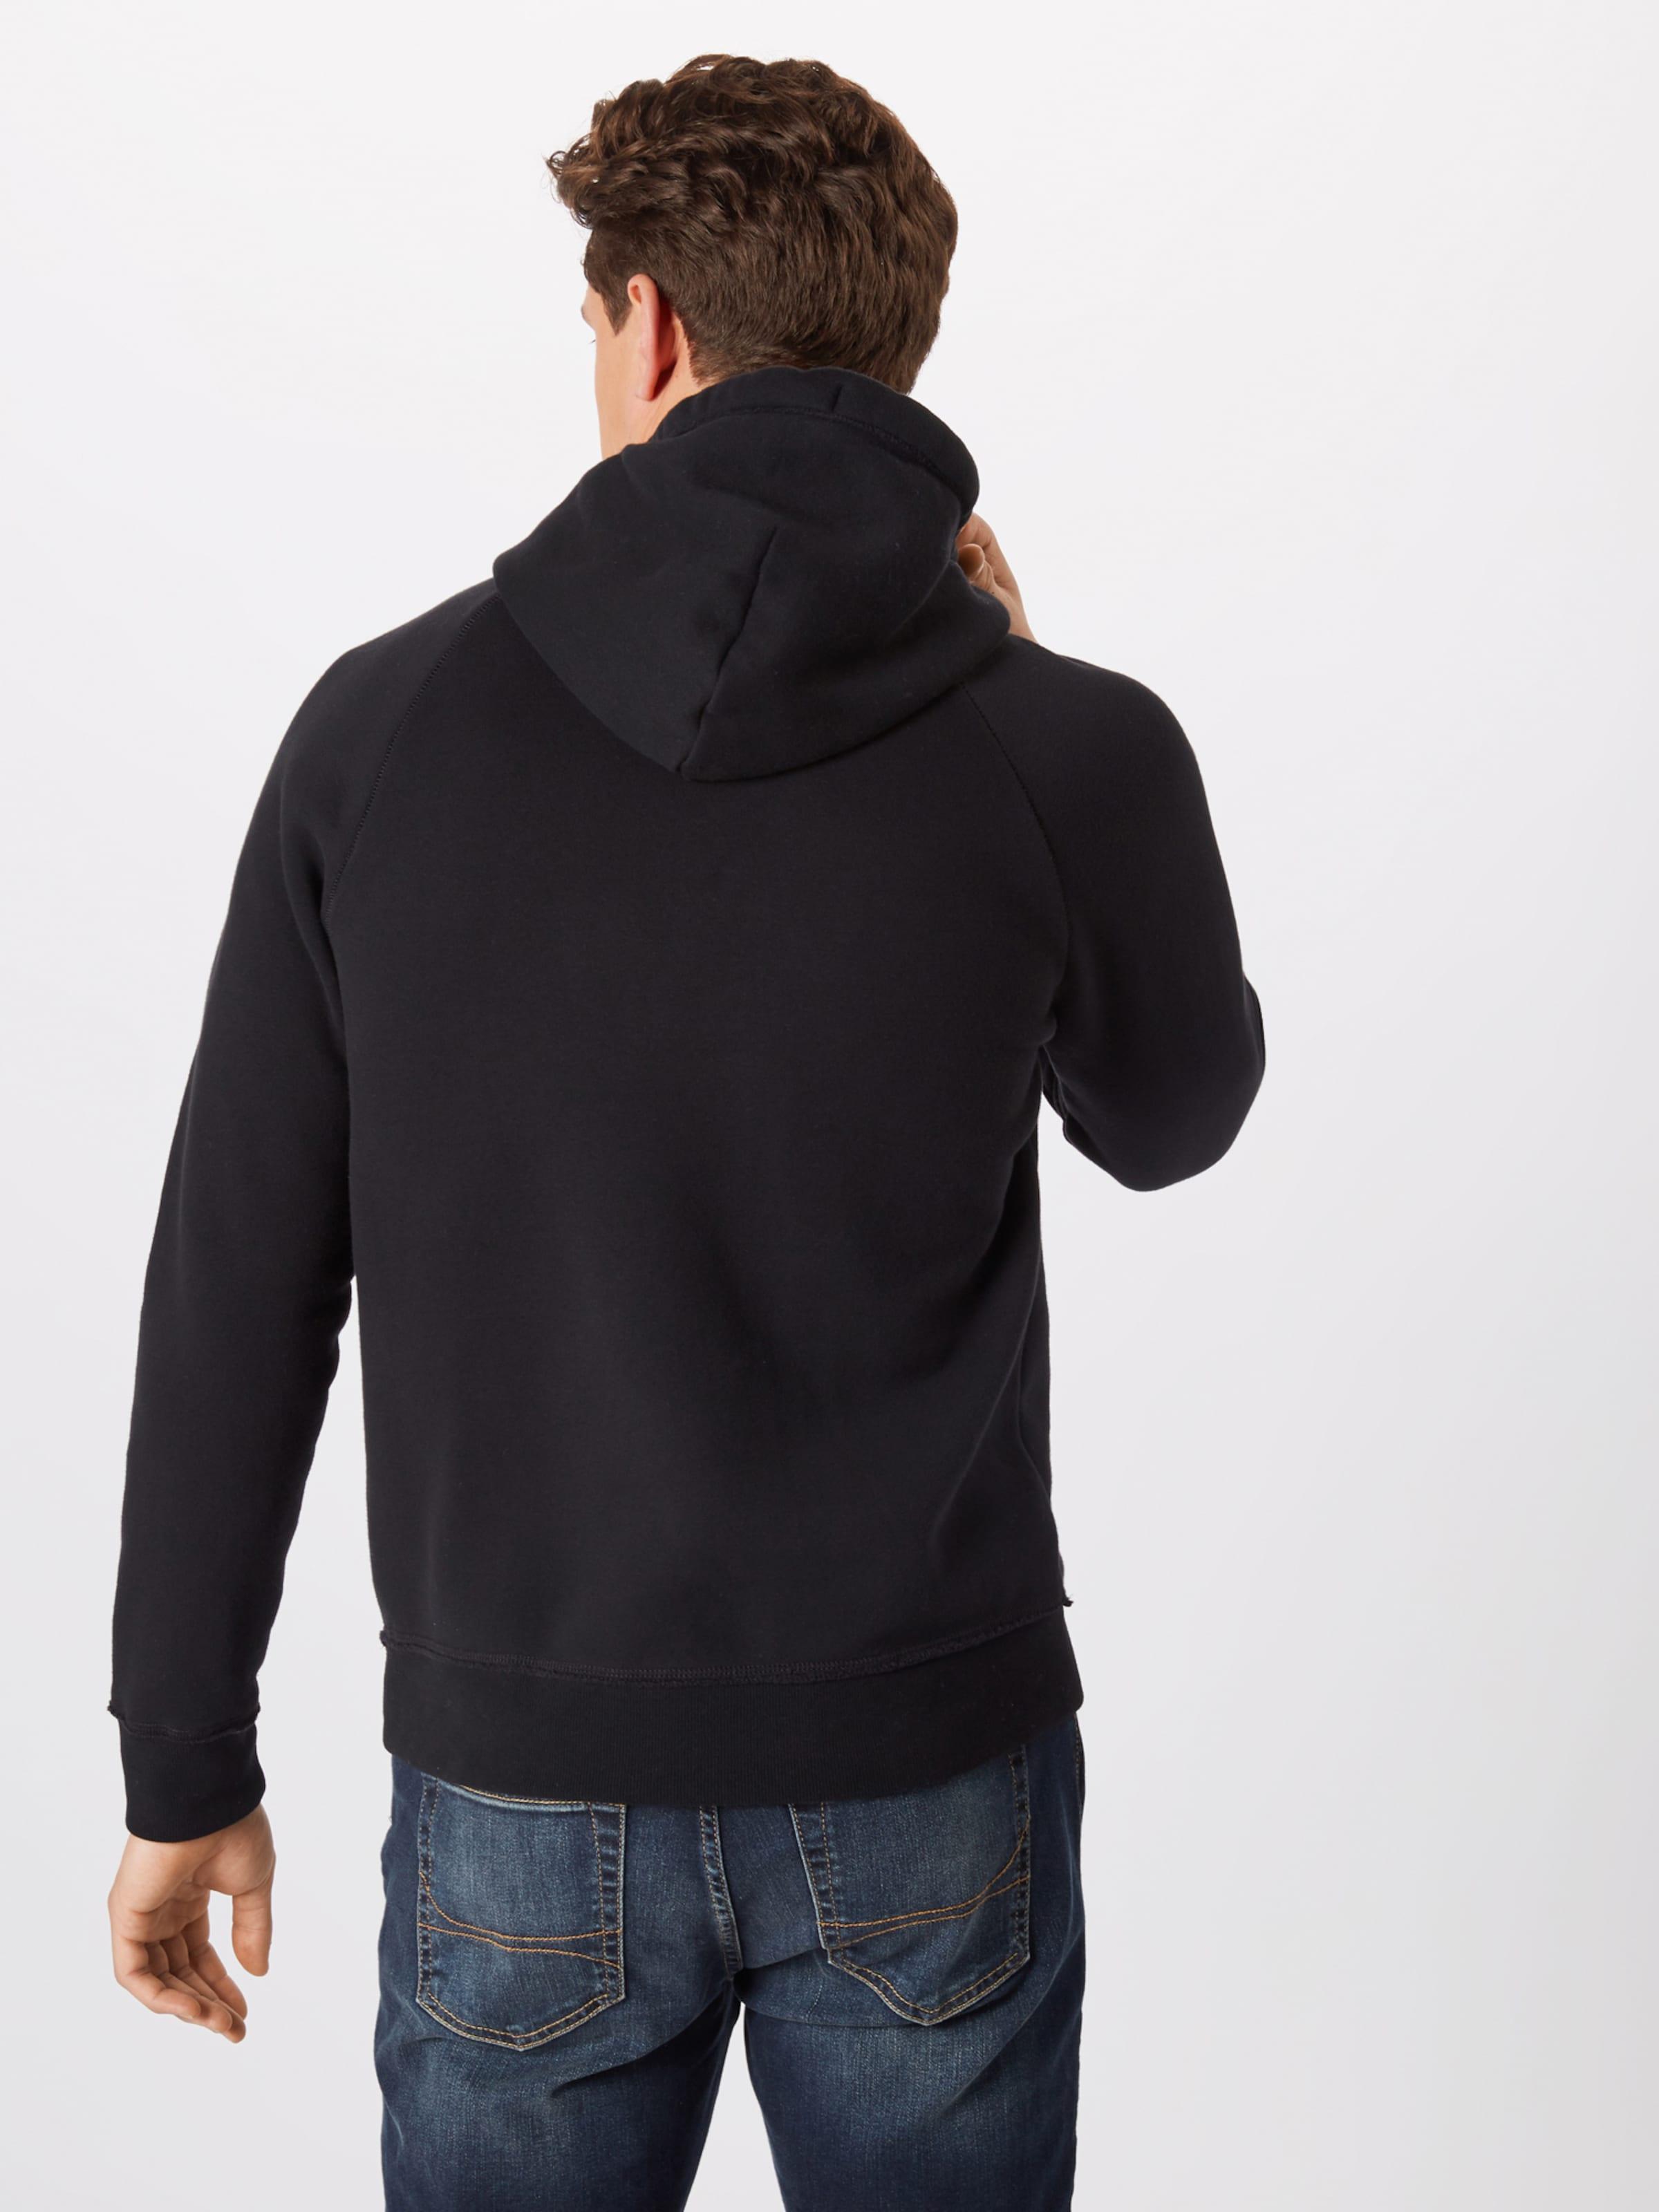 Lc In 10cc' Po 'dtc Sweatshirt Hollister Schwarz mnw0vN8O